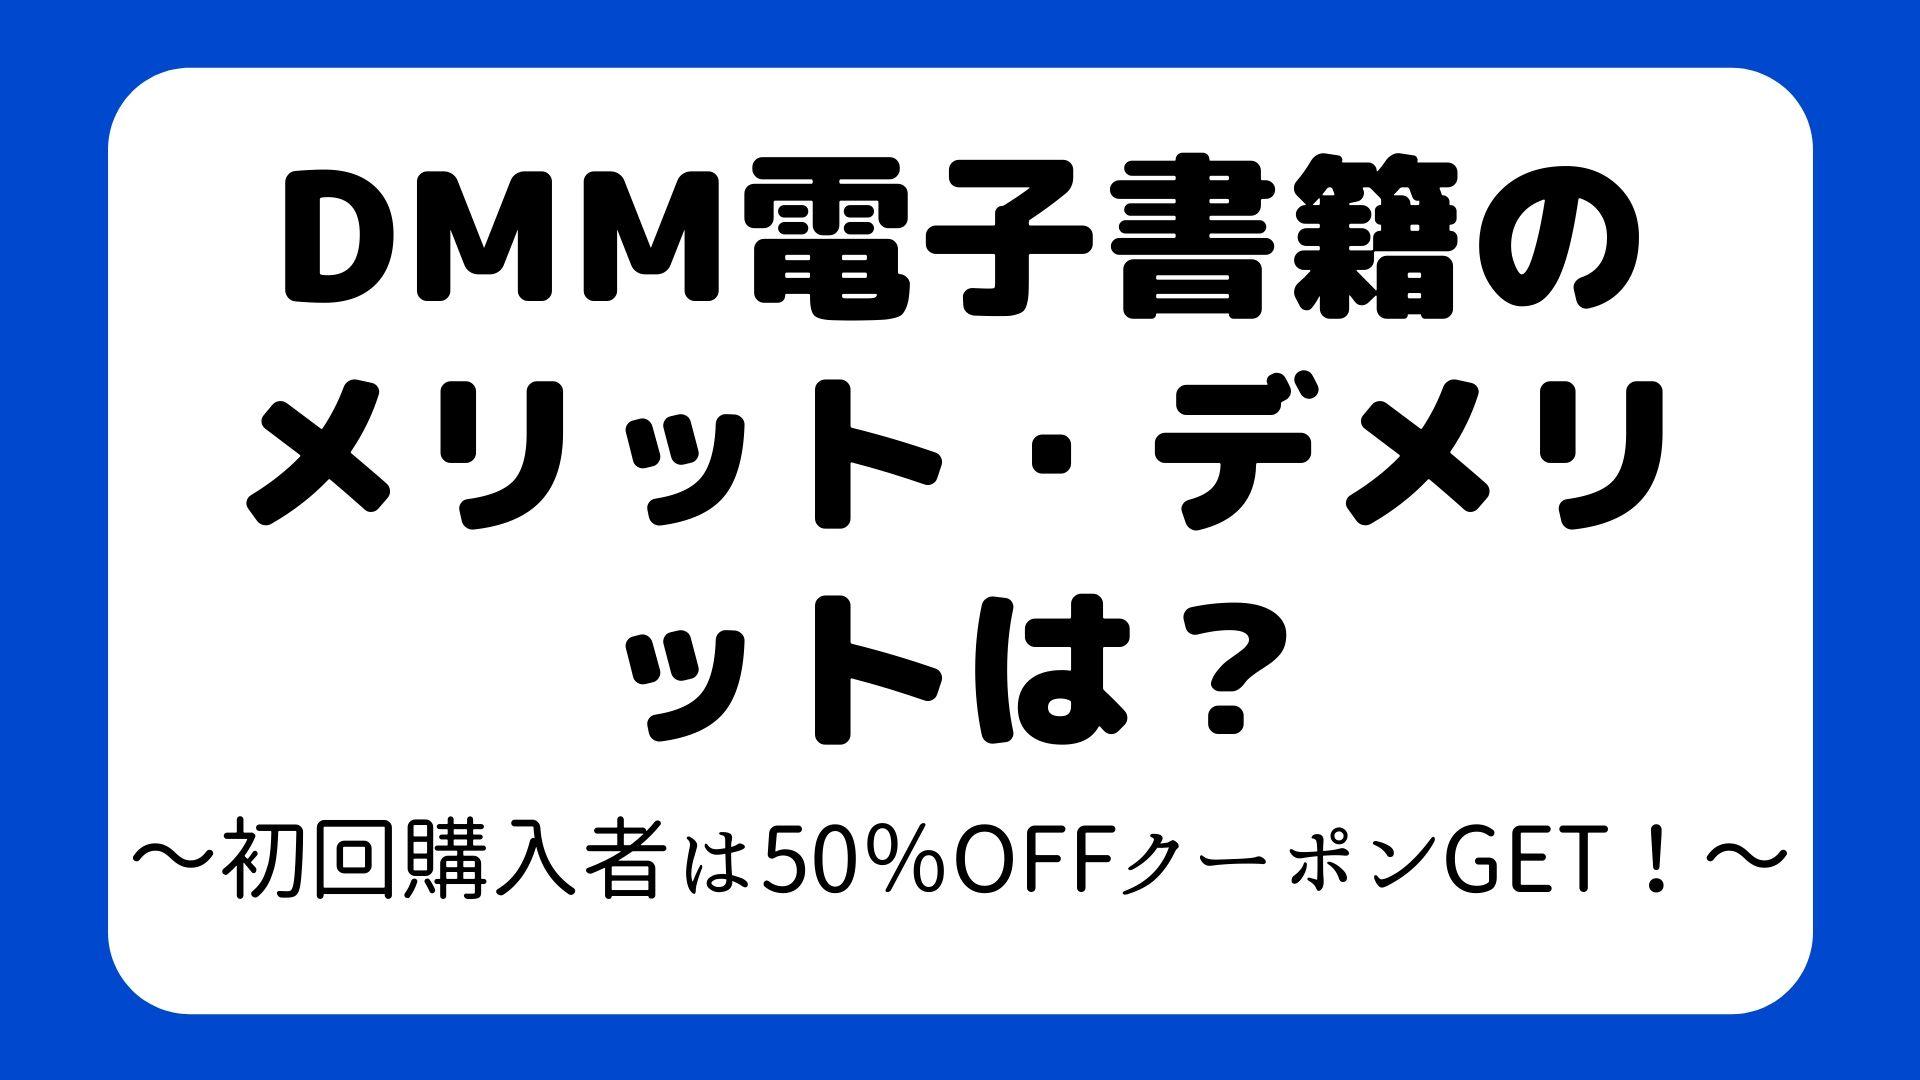 DMM電子書籍のメリット・デメリットは?~初回購入者は50%OFFクーポンGET!~